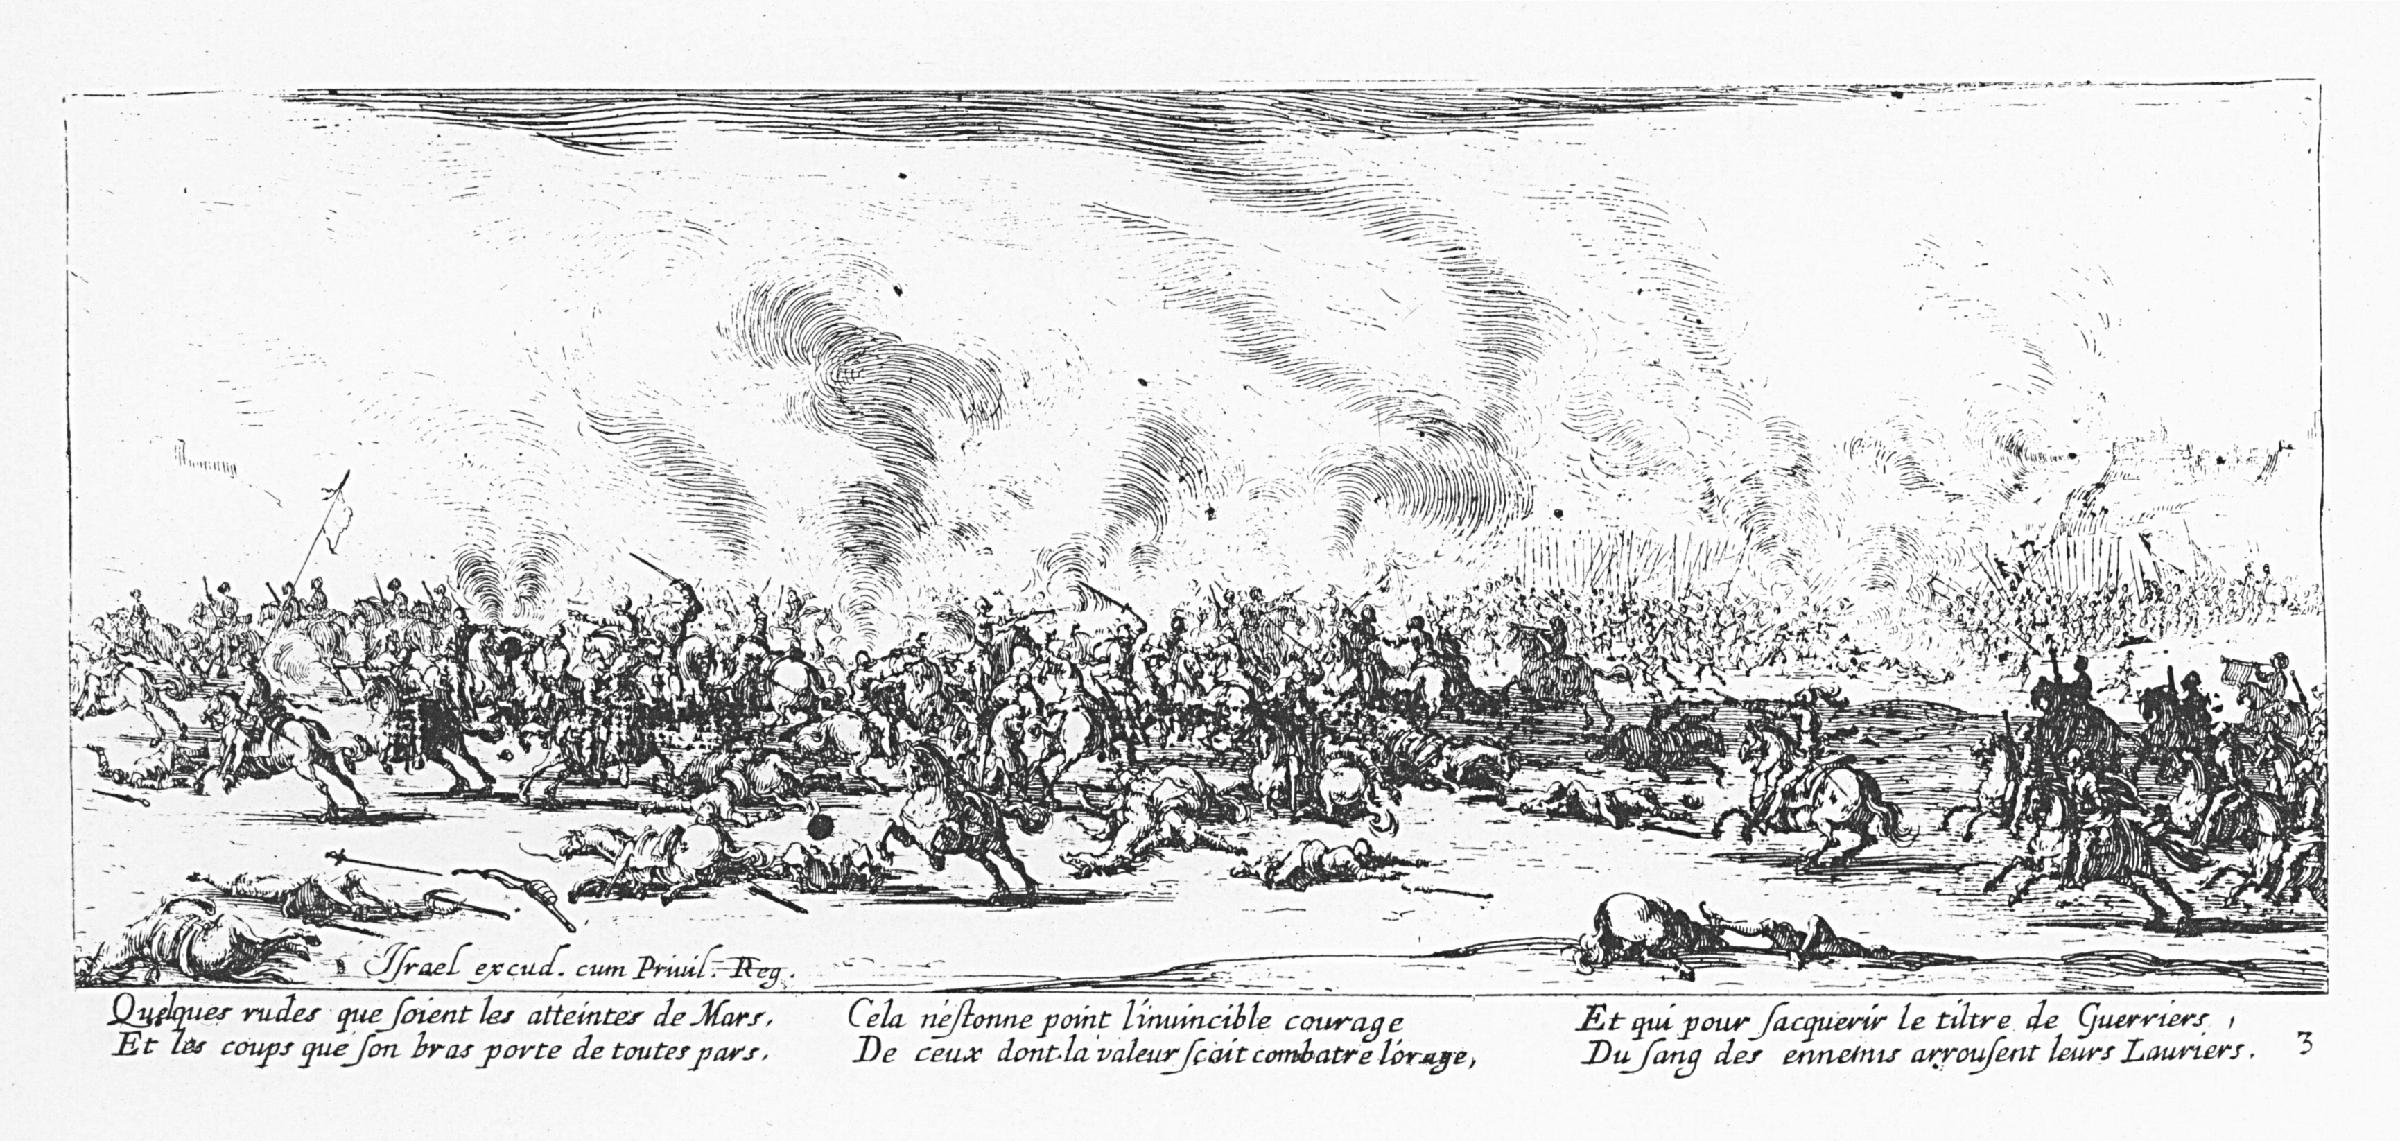 La bataille.Sumber gambar: wikimedia.org